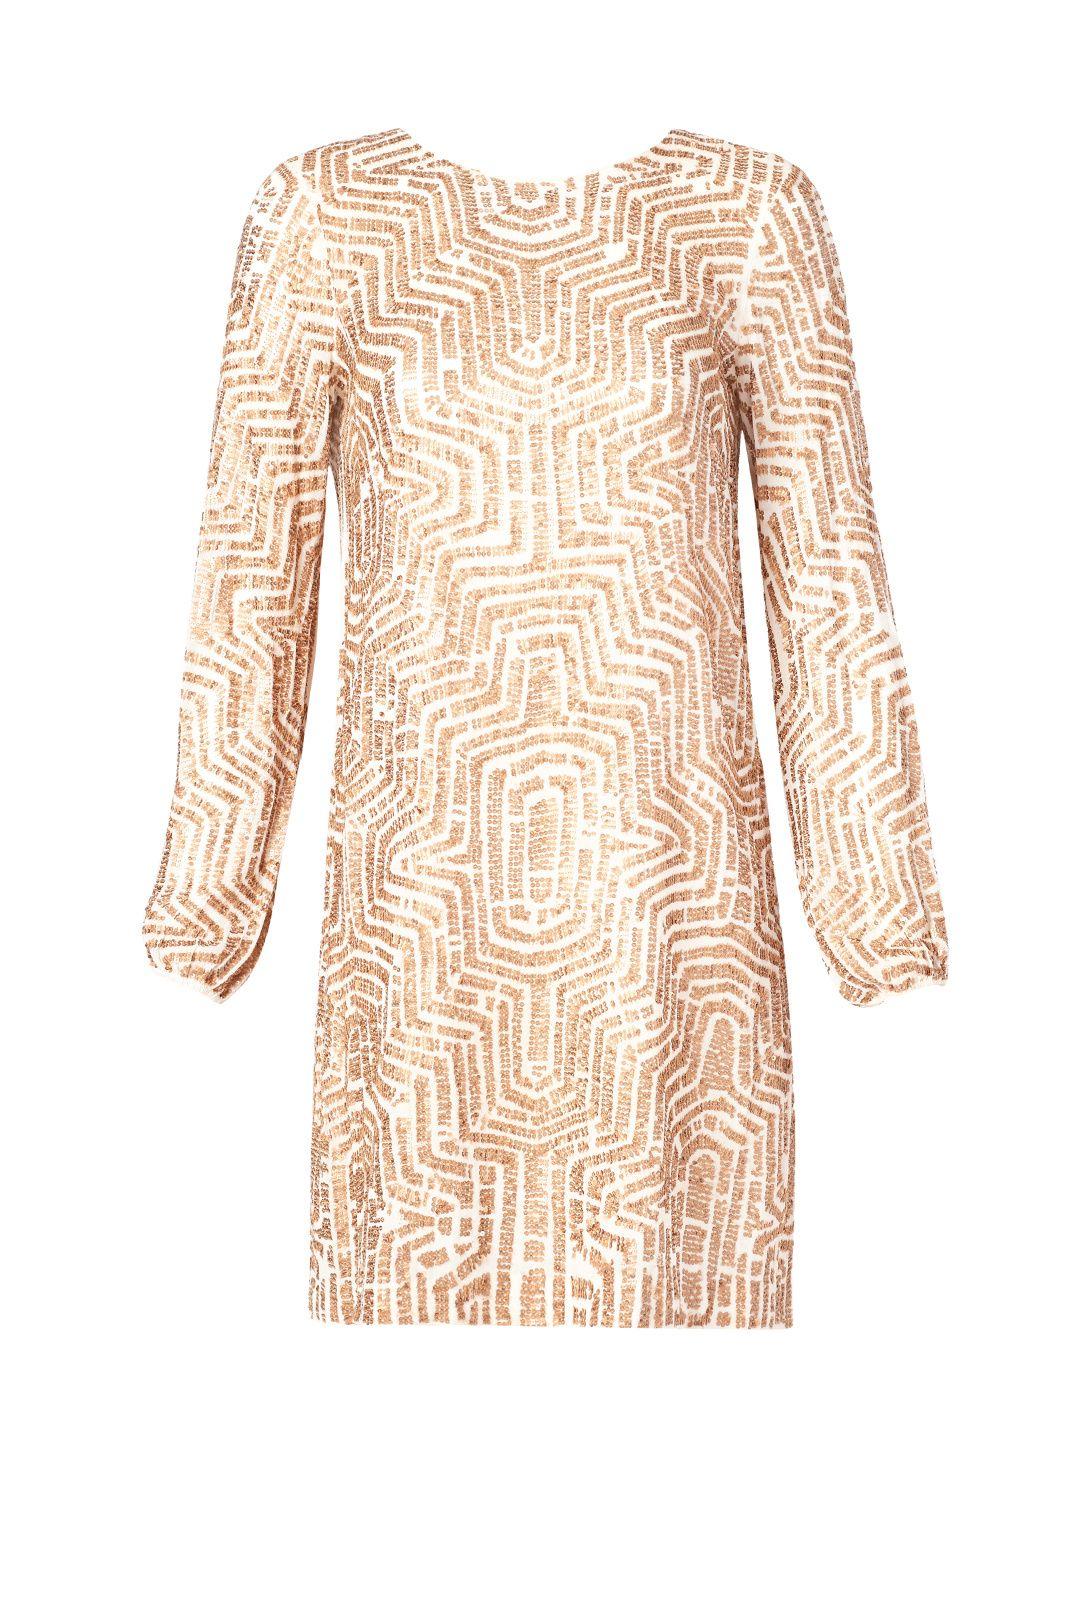 Badgley Mischka Sequin Maze Shift Shift Dress Pattern Sequin Sheath Dress Badgley Mischka Shoes Wedding [ 1620 x 1080 Pixel ]